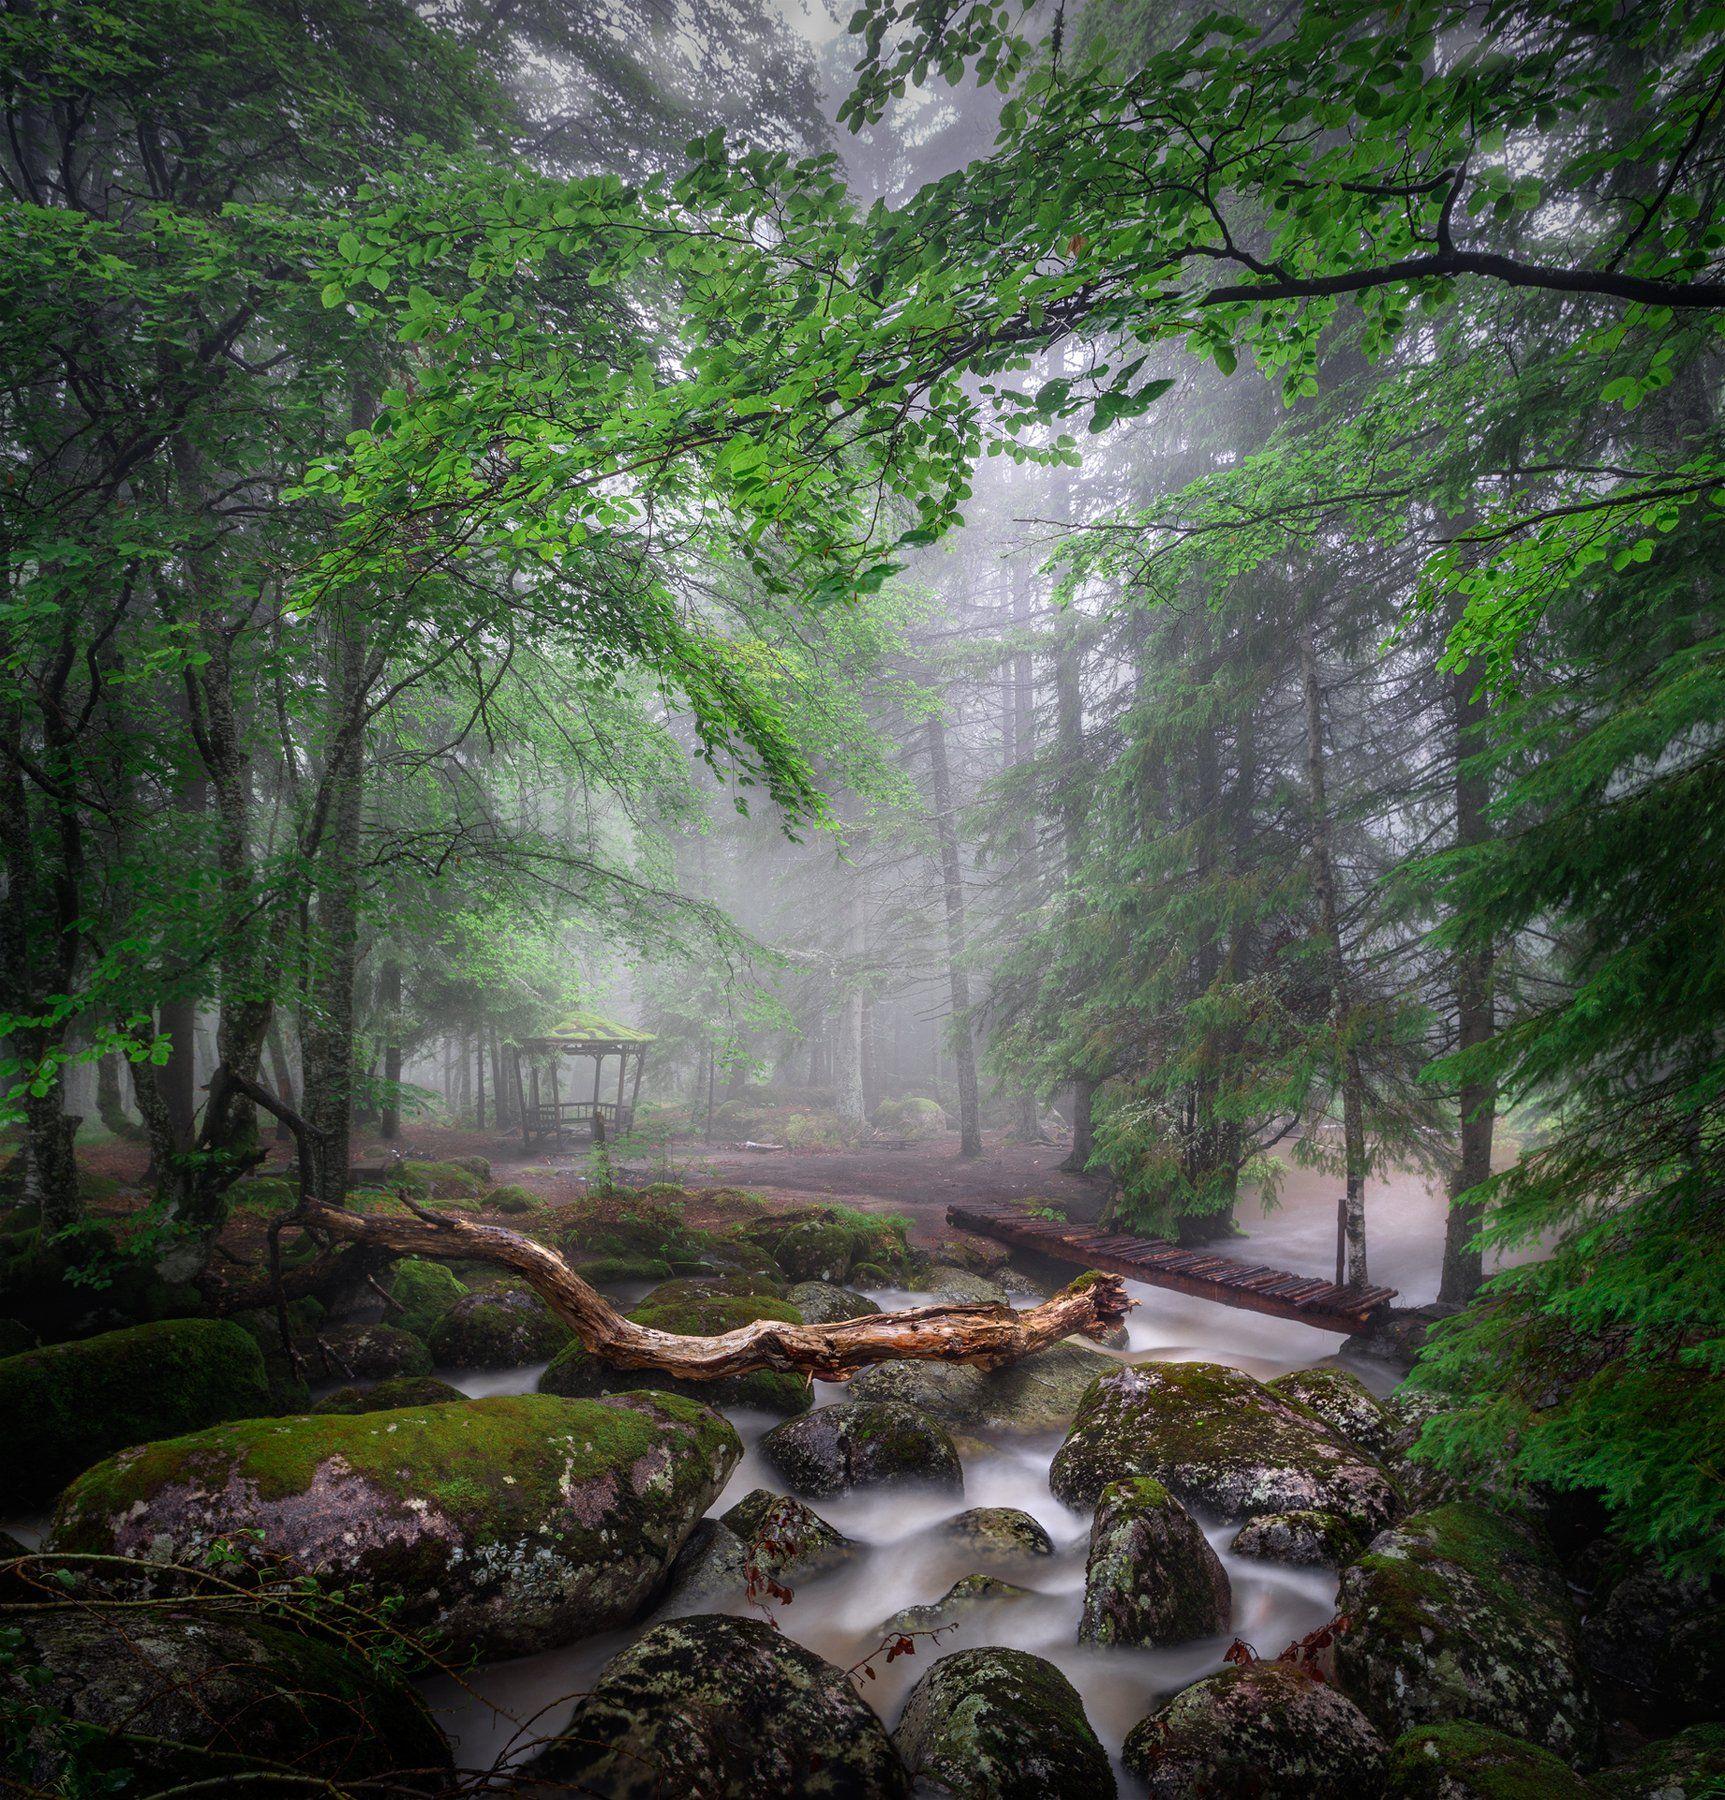 landscape nature scenery forest wood mist misty fog foggy mountain vitosha bulgaria туман лес, Александър Александров